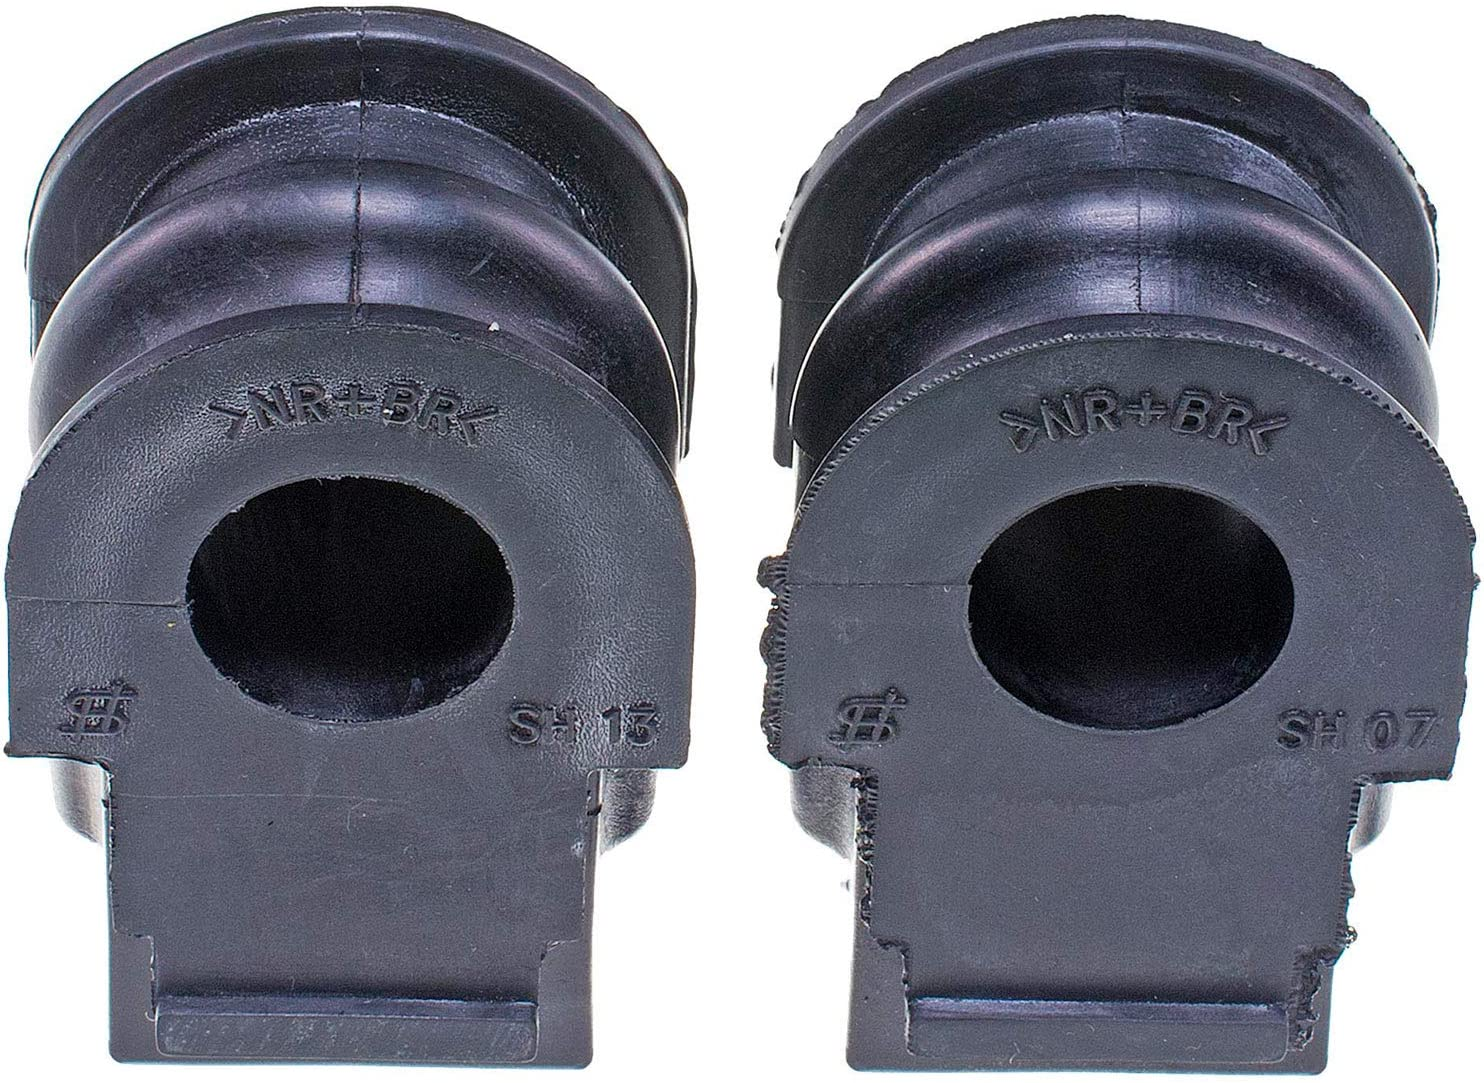 MAS Industries BSK70009 Suspension Stabilizer Bar Bushing Kit